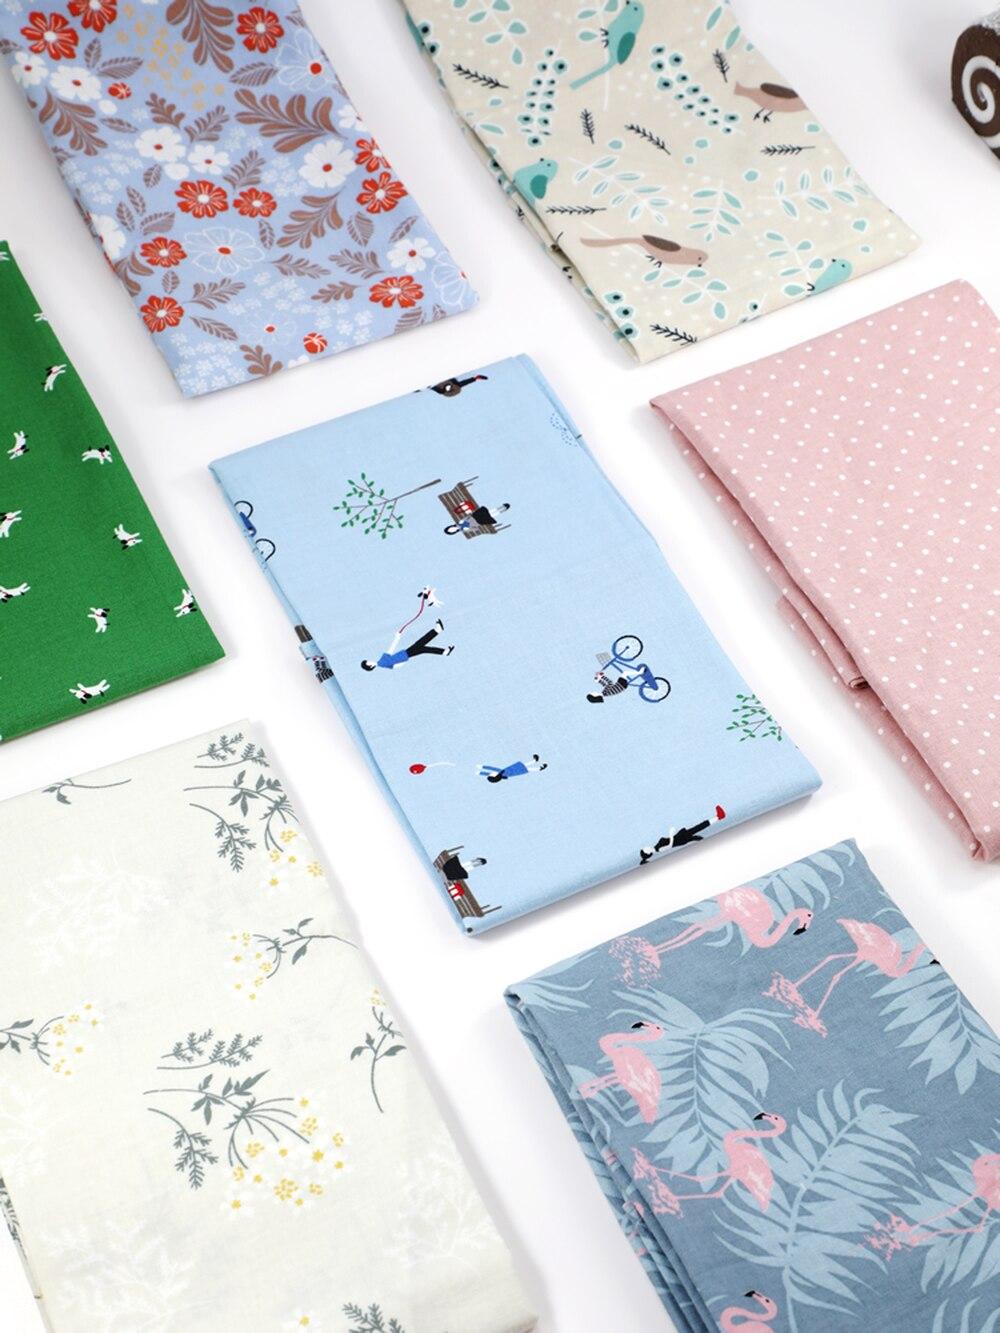 Korea Cute Handkerchief Small Fresh Handkerchief Hand Towel Cotton Women's Square Towel Napkin Hair Band Decorative Cloth